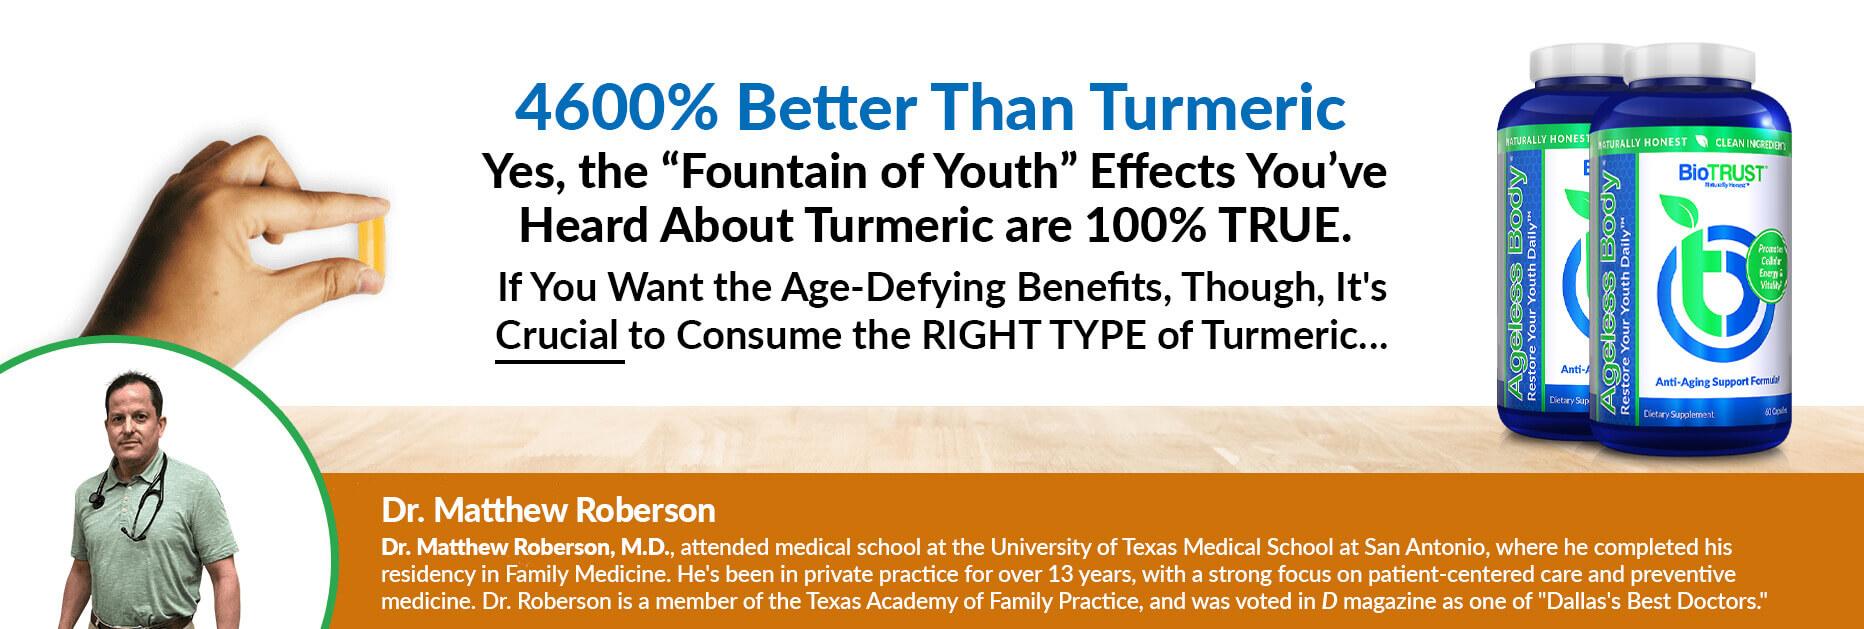 4600% Better Than Turmeric